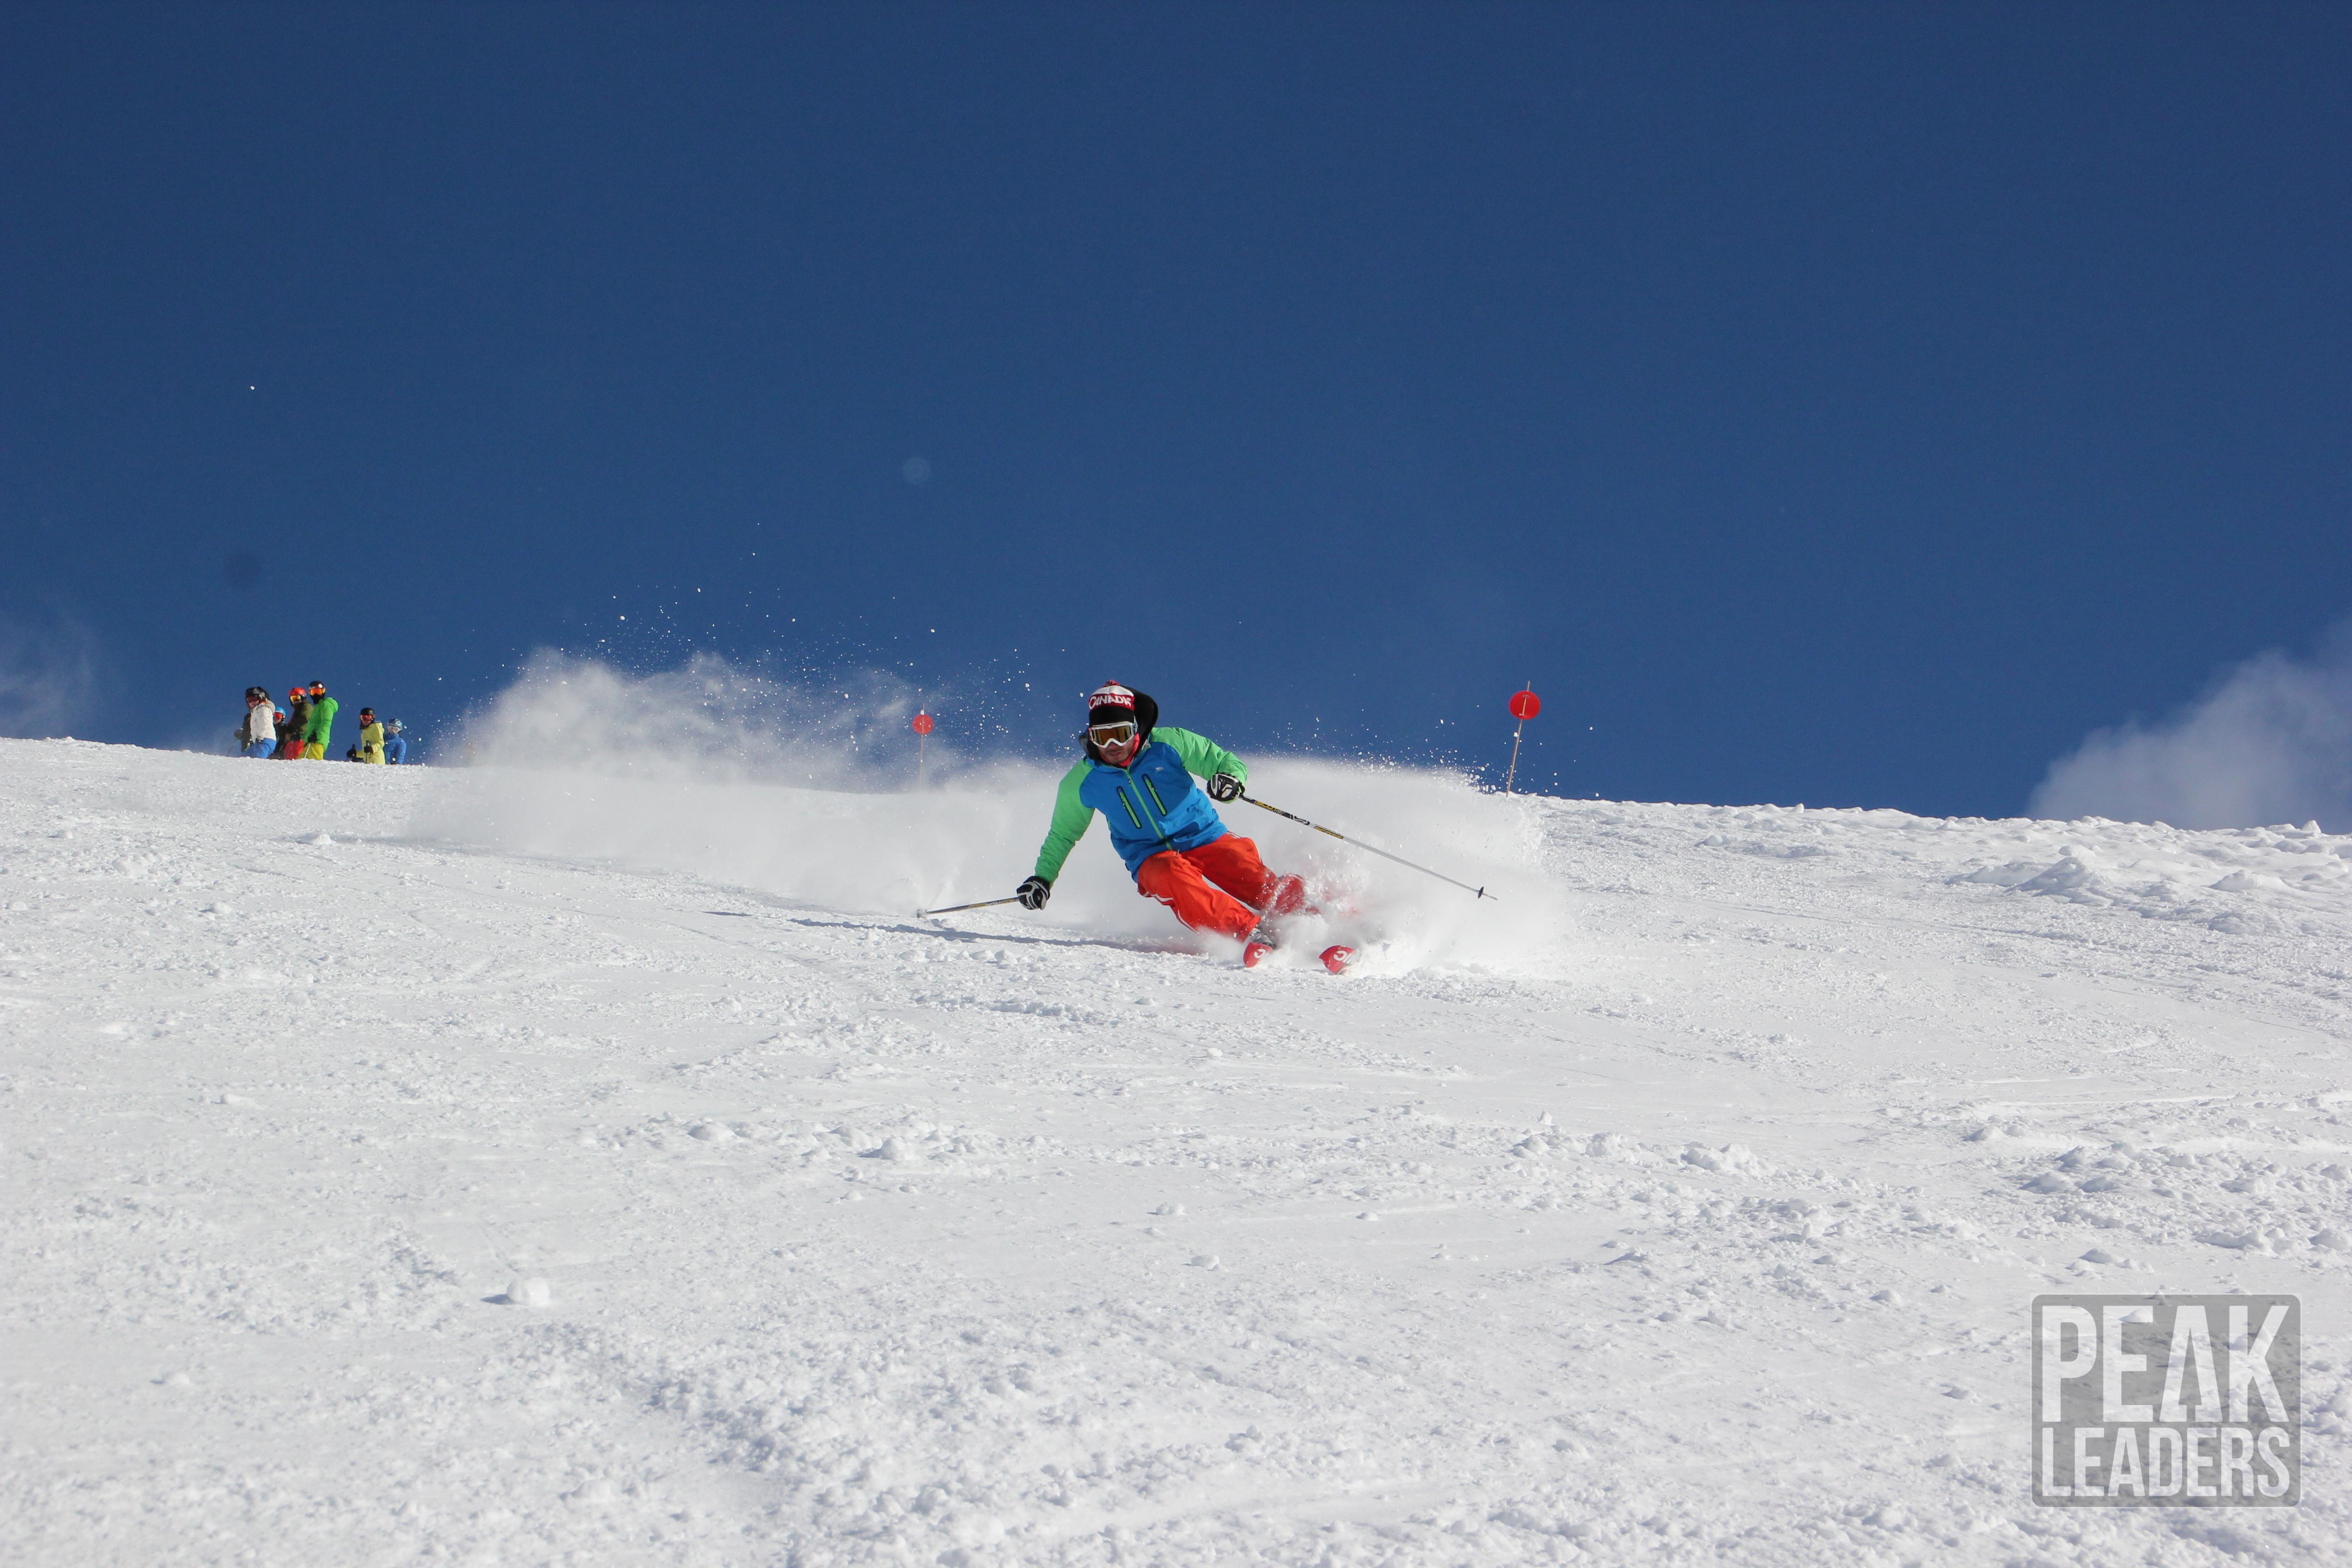 Ski Instructor graduate Georgina received training from Agustin Torres, former Olympian.